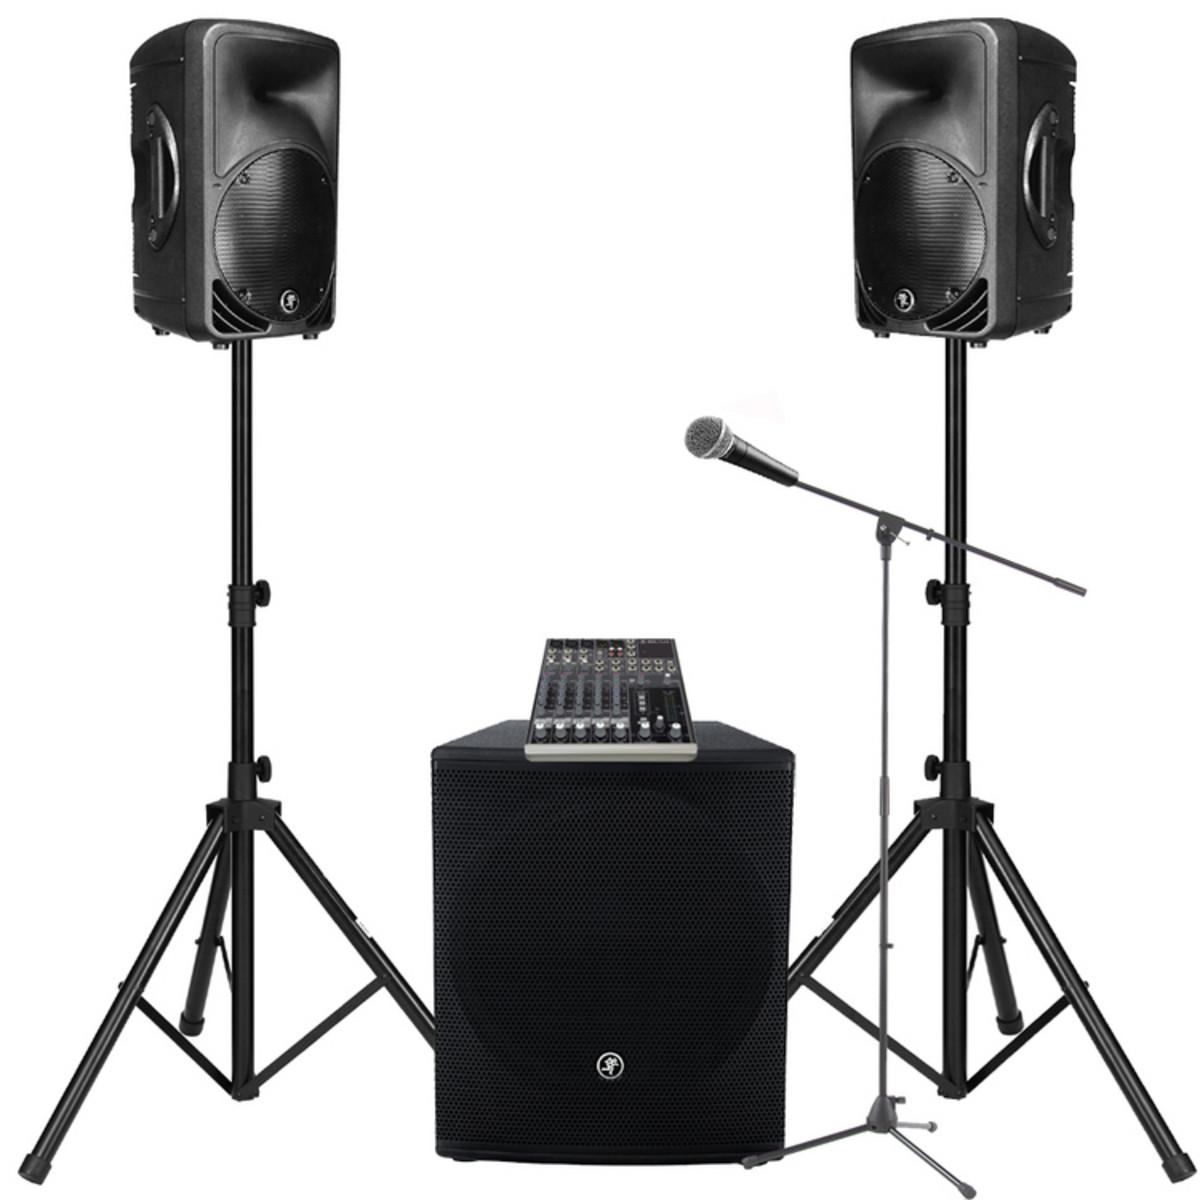 DISC SRM350V2 Mackie PA System + Shure SM58 Bundle bei Gear4music